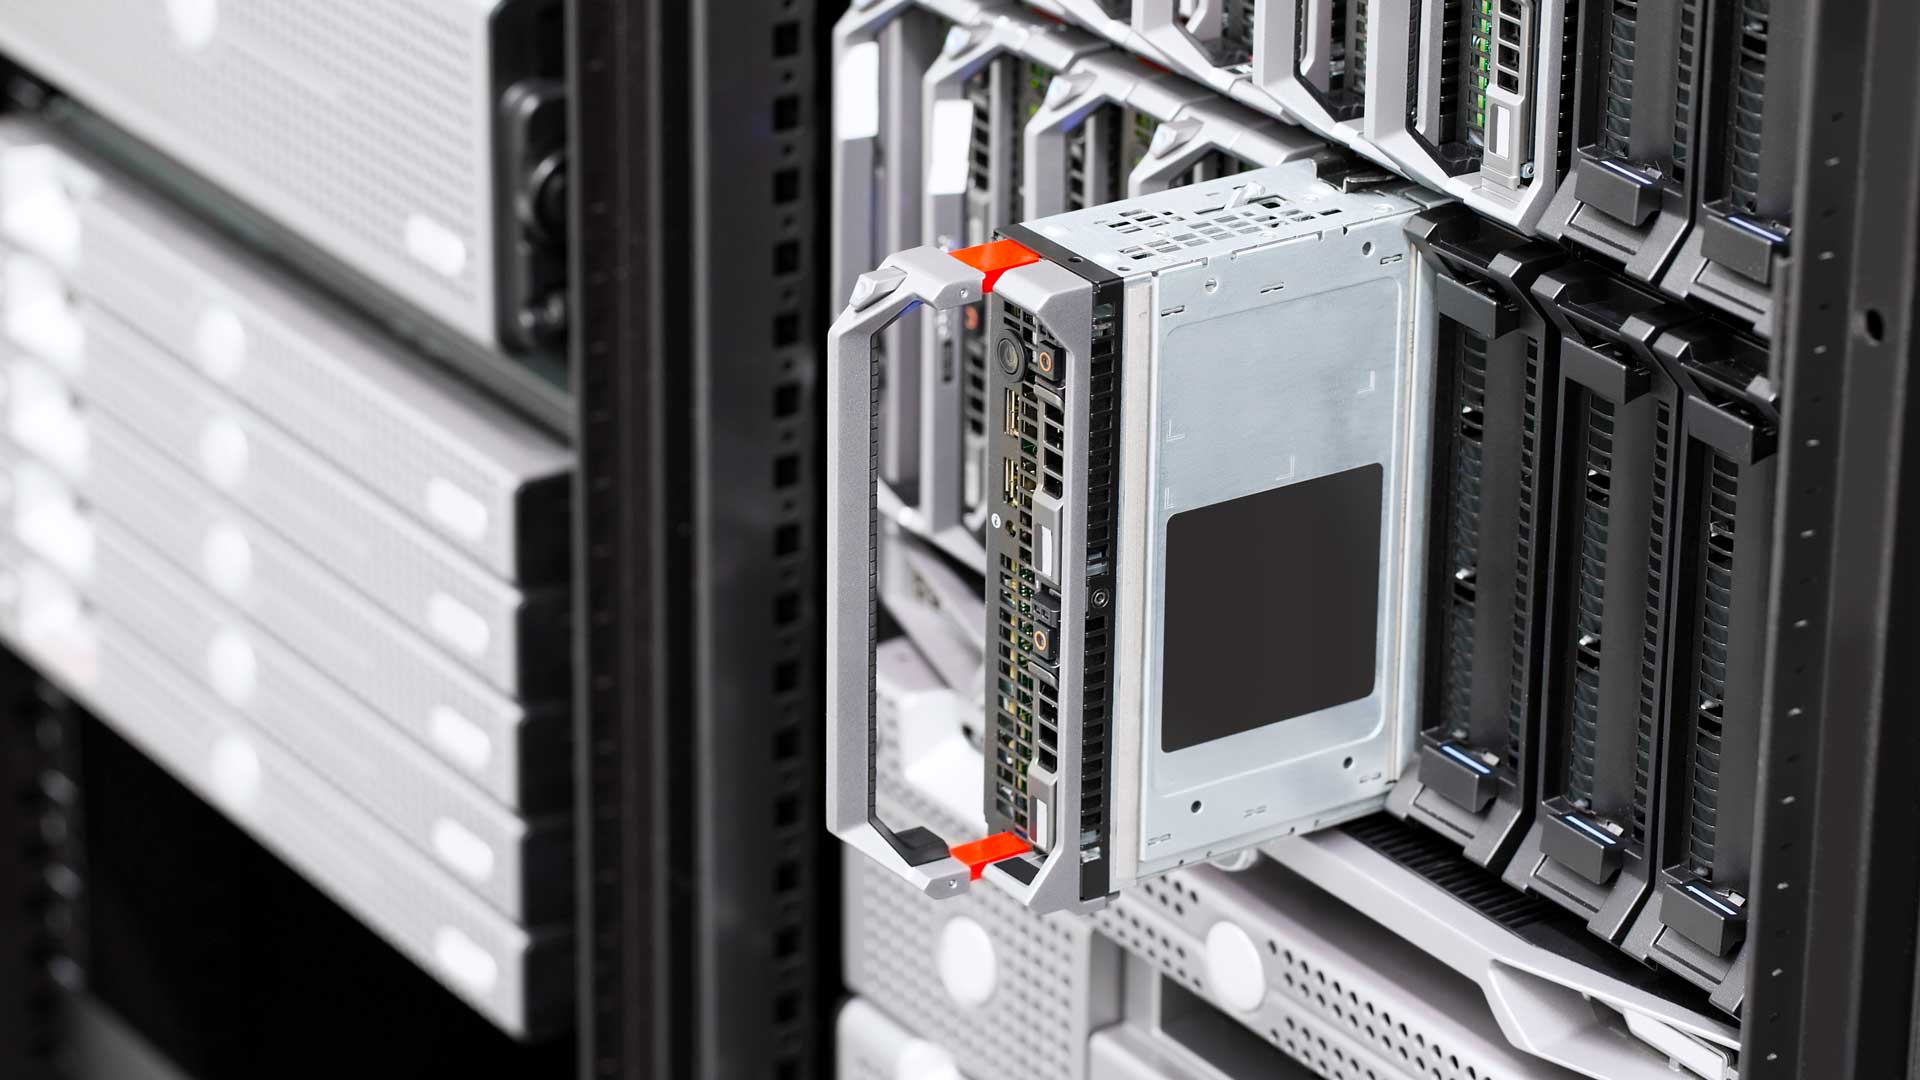 Image of server in a server rack